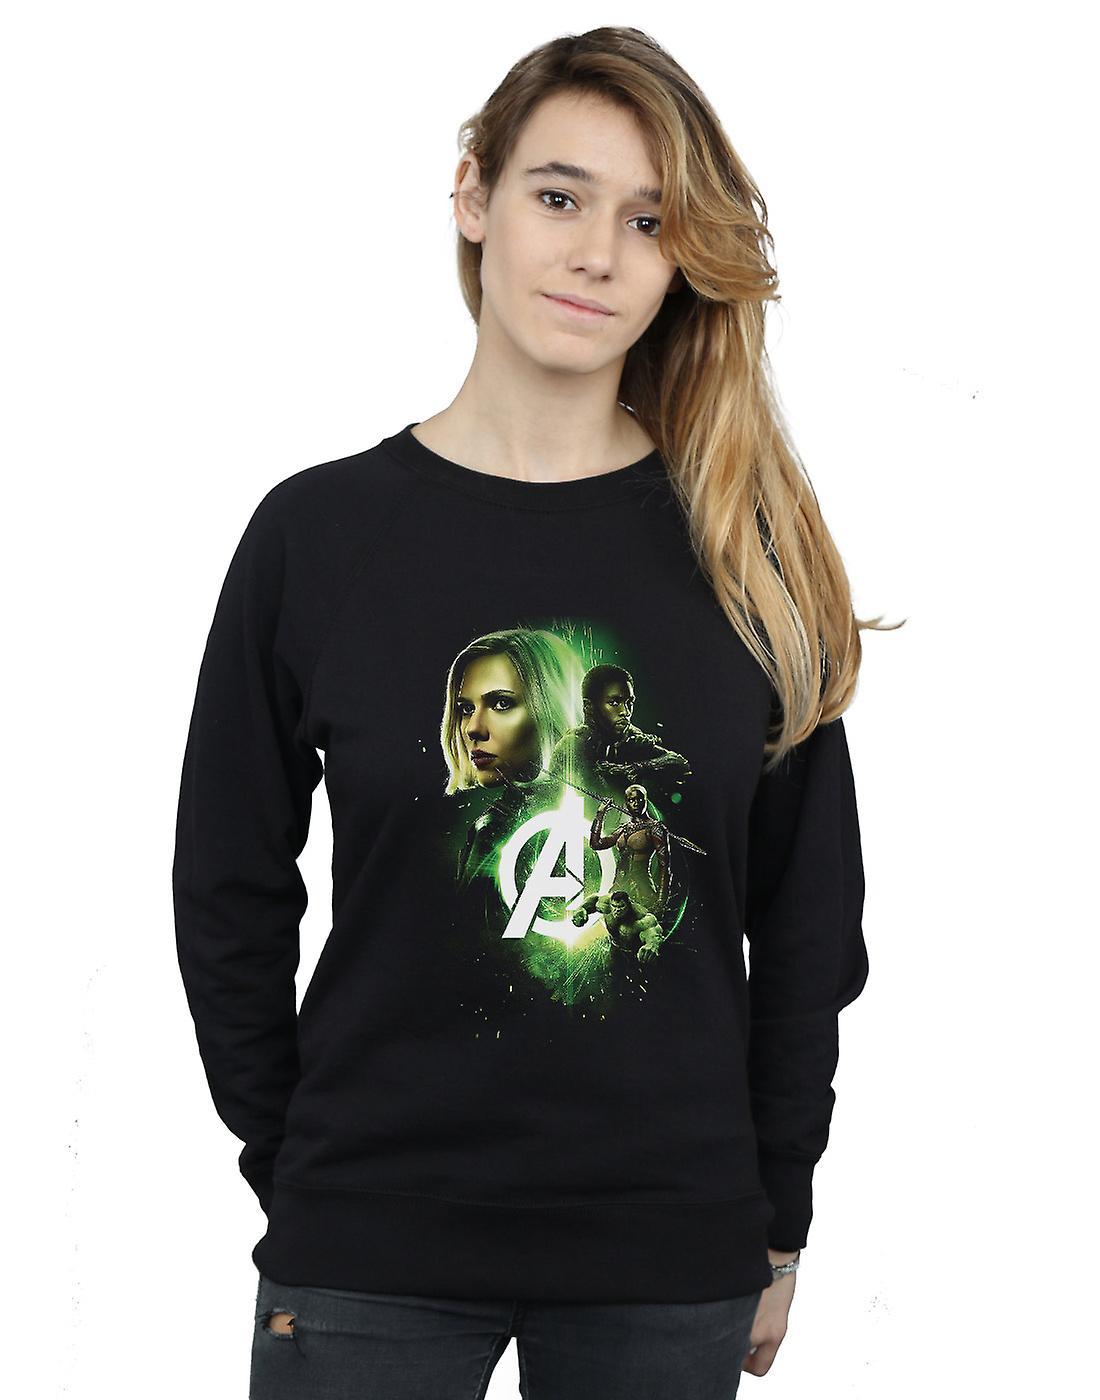 Marvel Women's Avengers Infinity War Widow Panther Team Up Sweatshirt